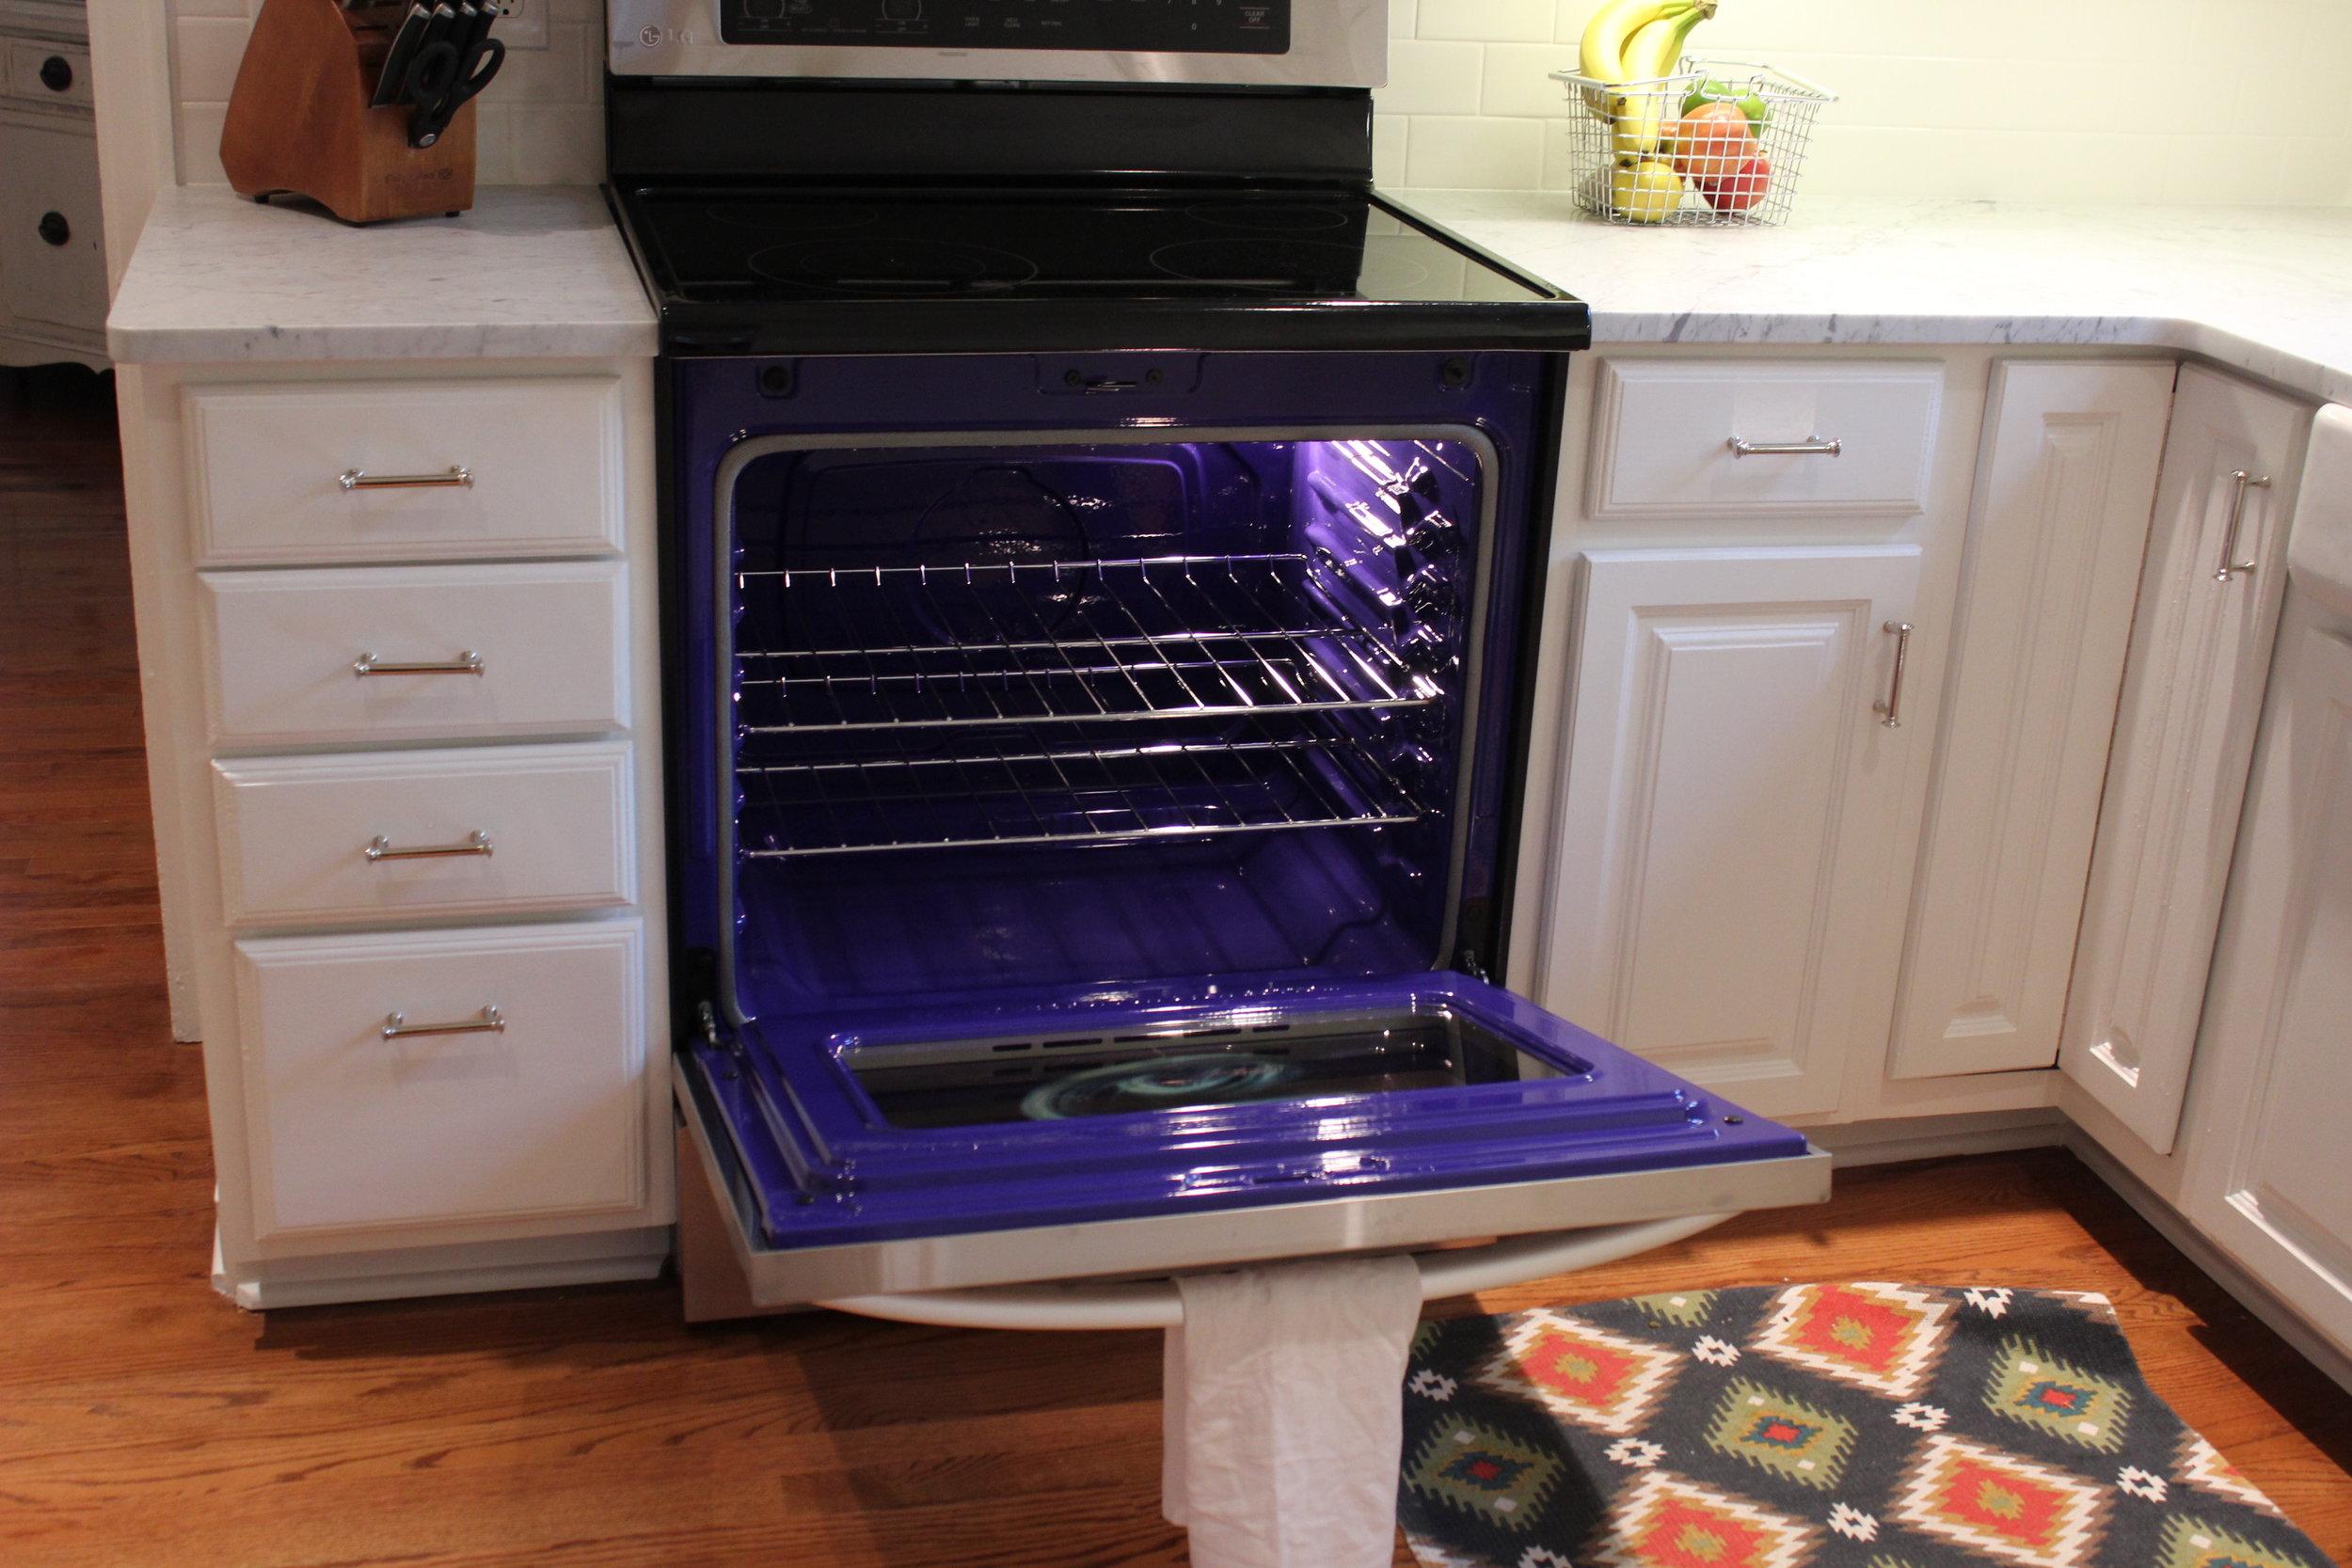 LG blue oven